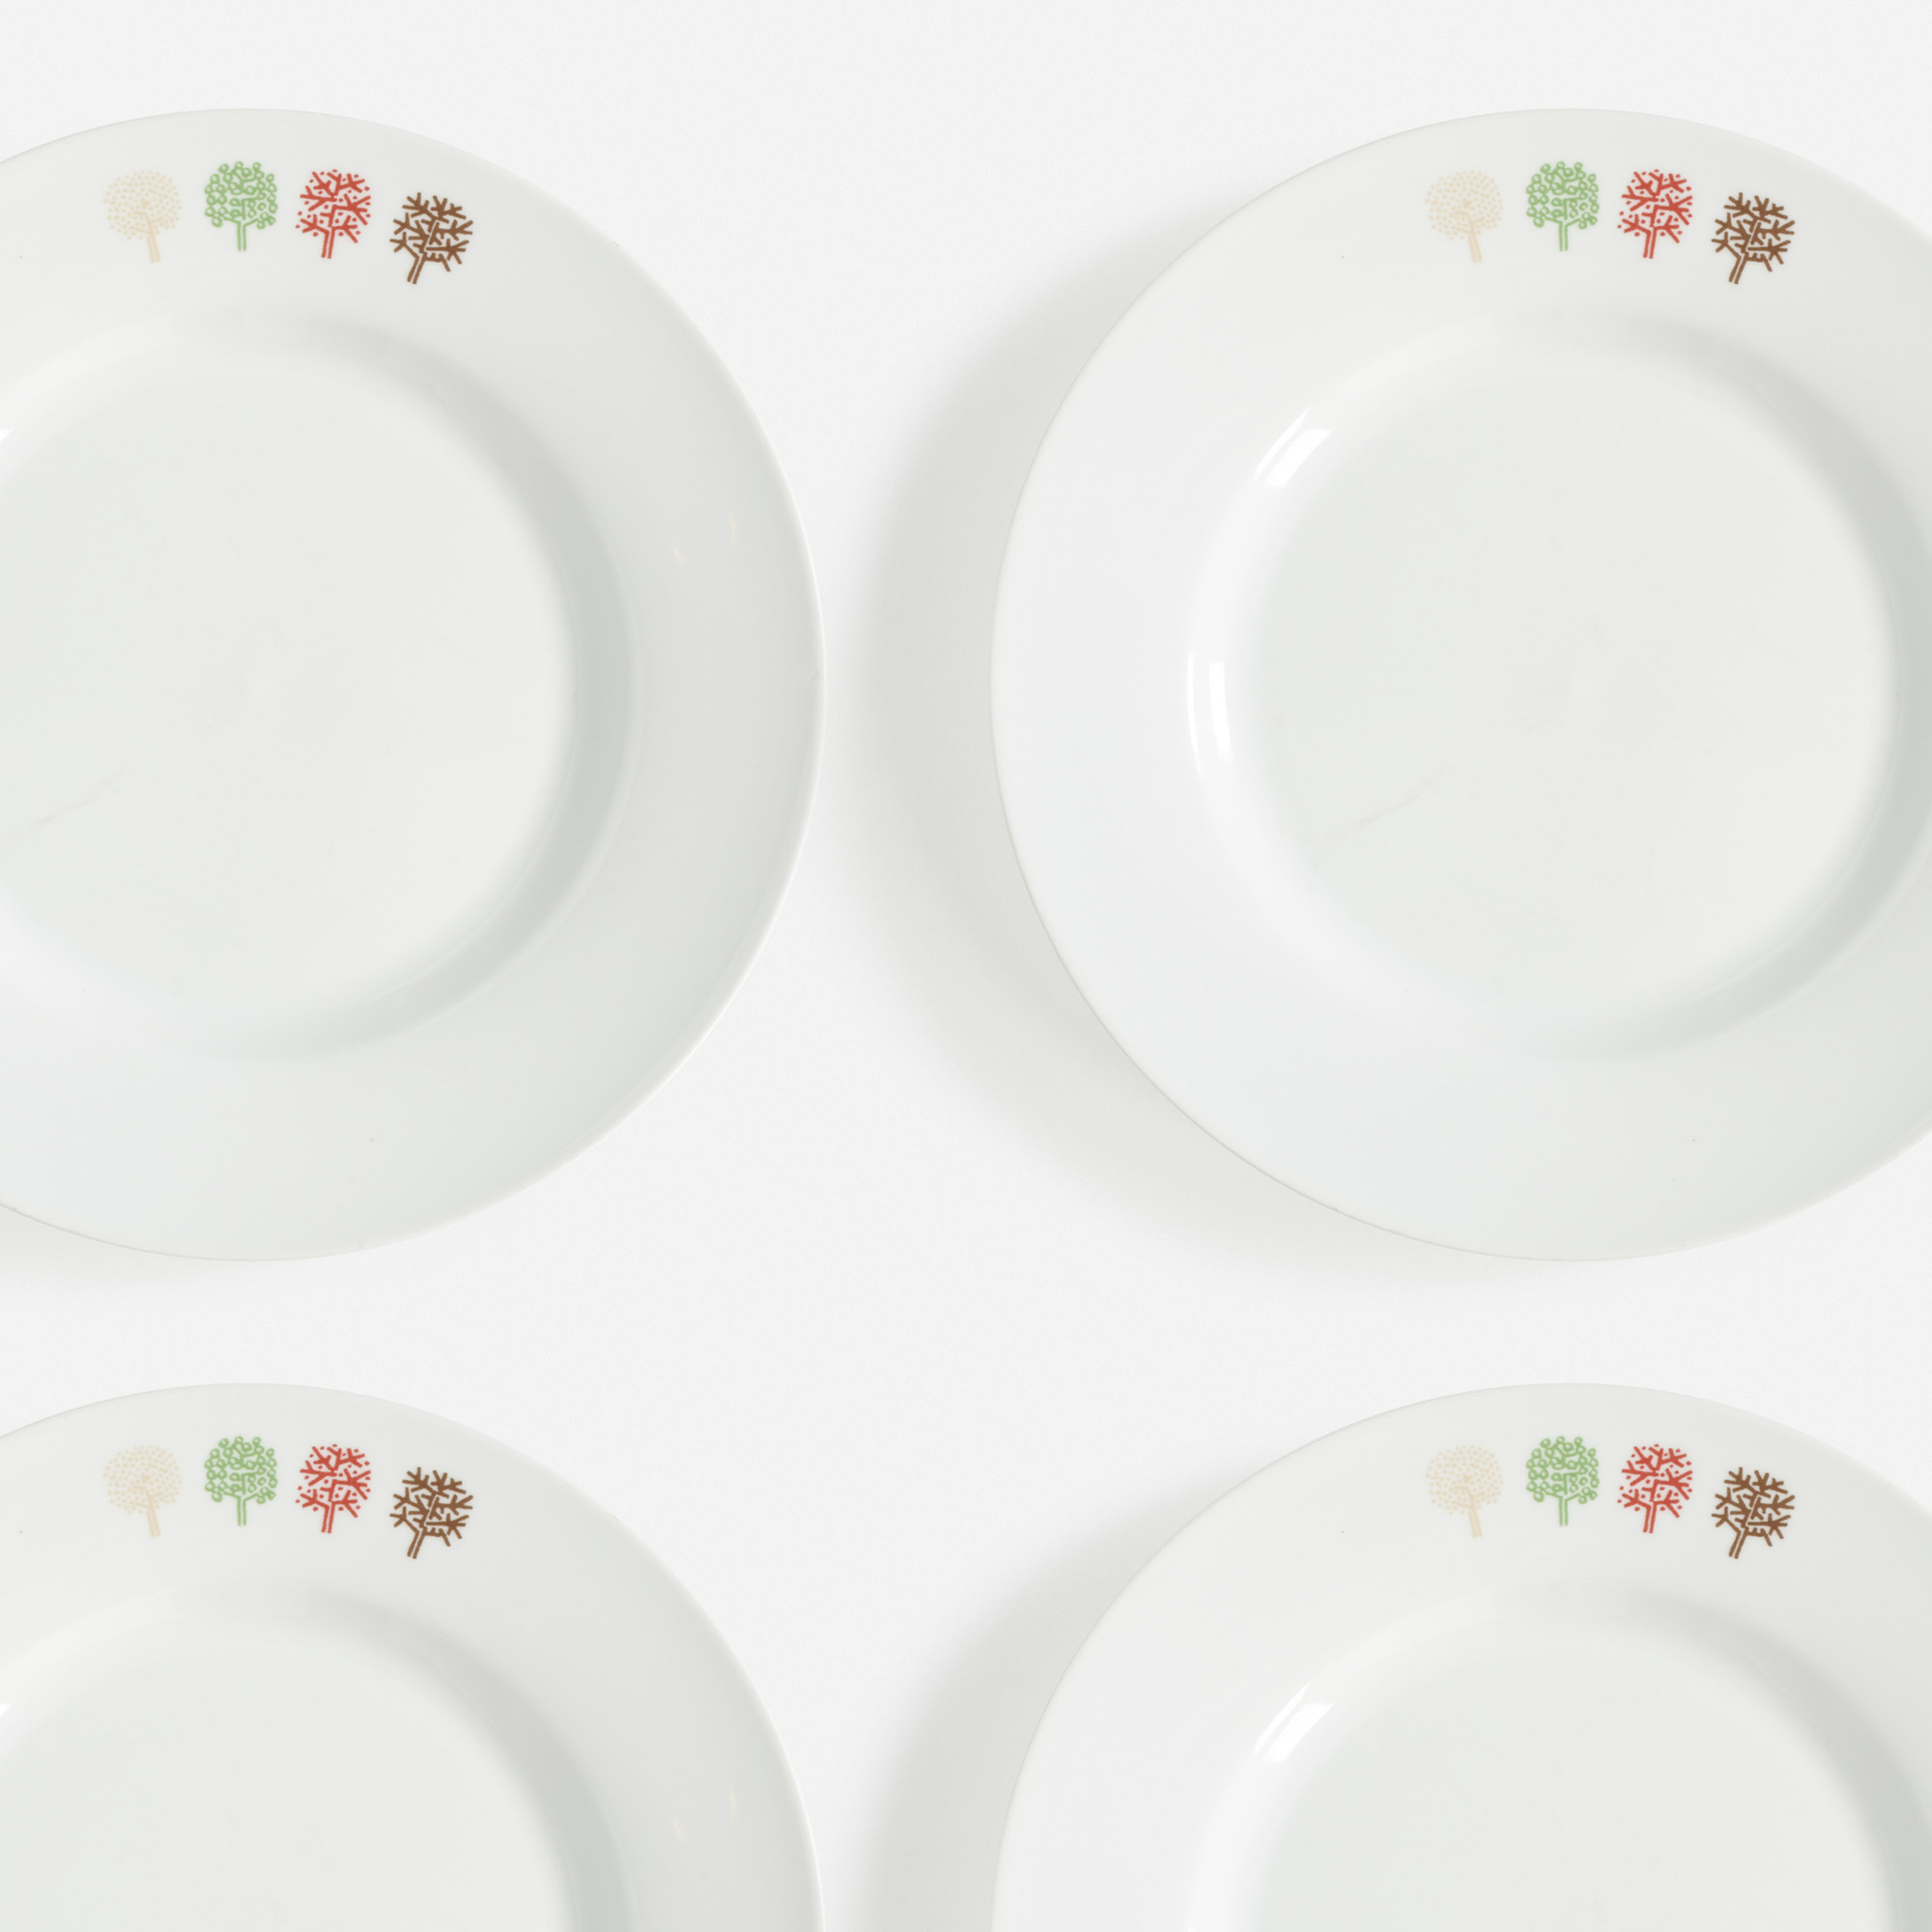 307:  / Four Seasons plates, set of twelve (1 of 1)